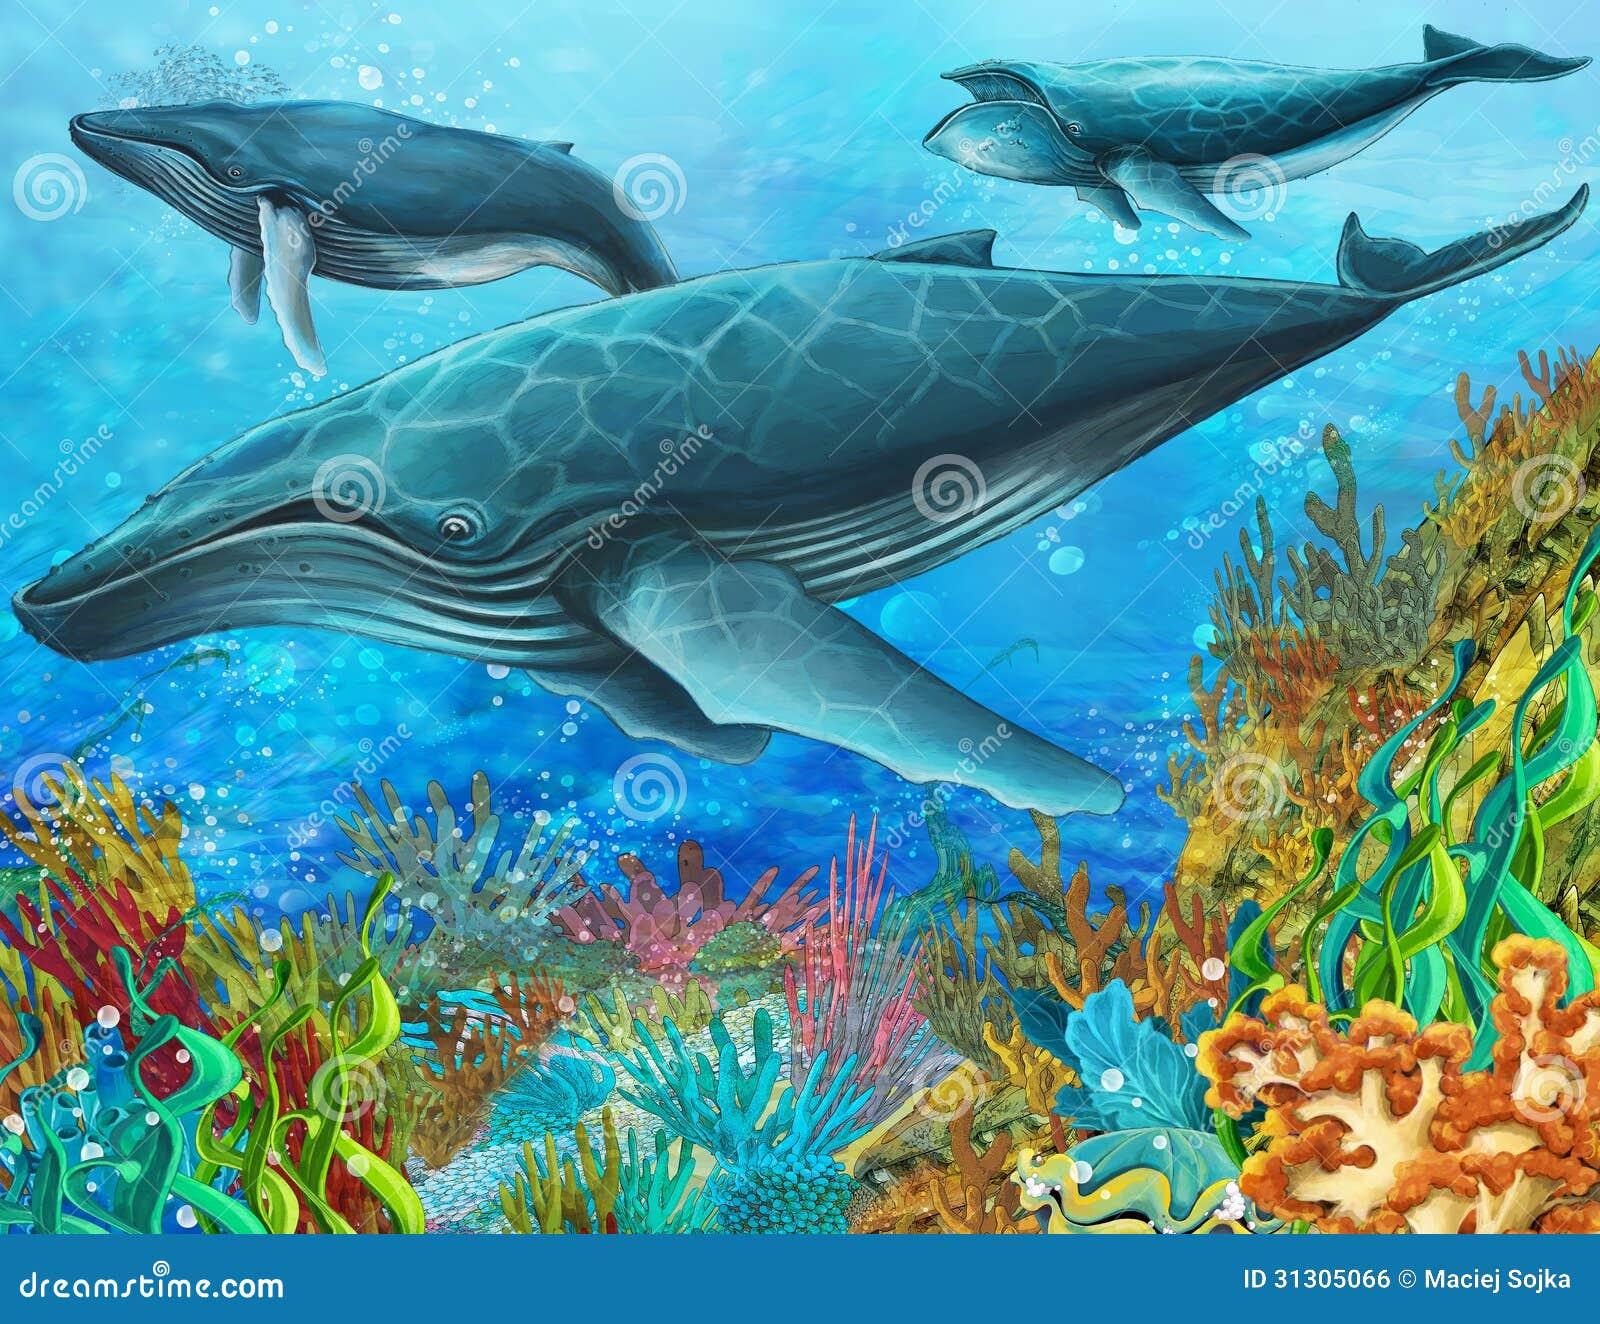 Fantástico Arrecifes De Coral Para Colorear E Imprimir Colección de ...